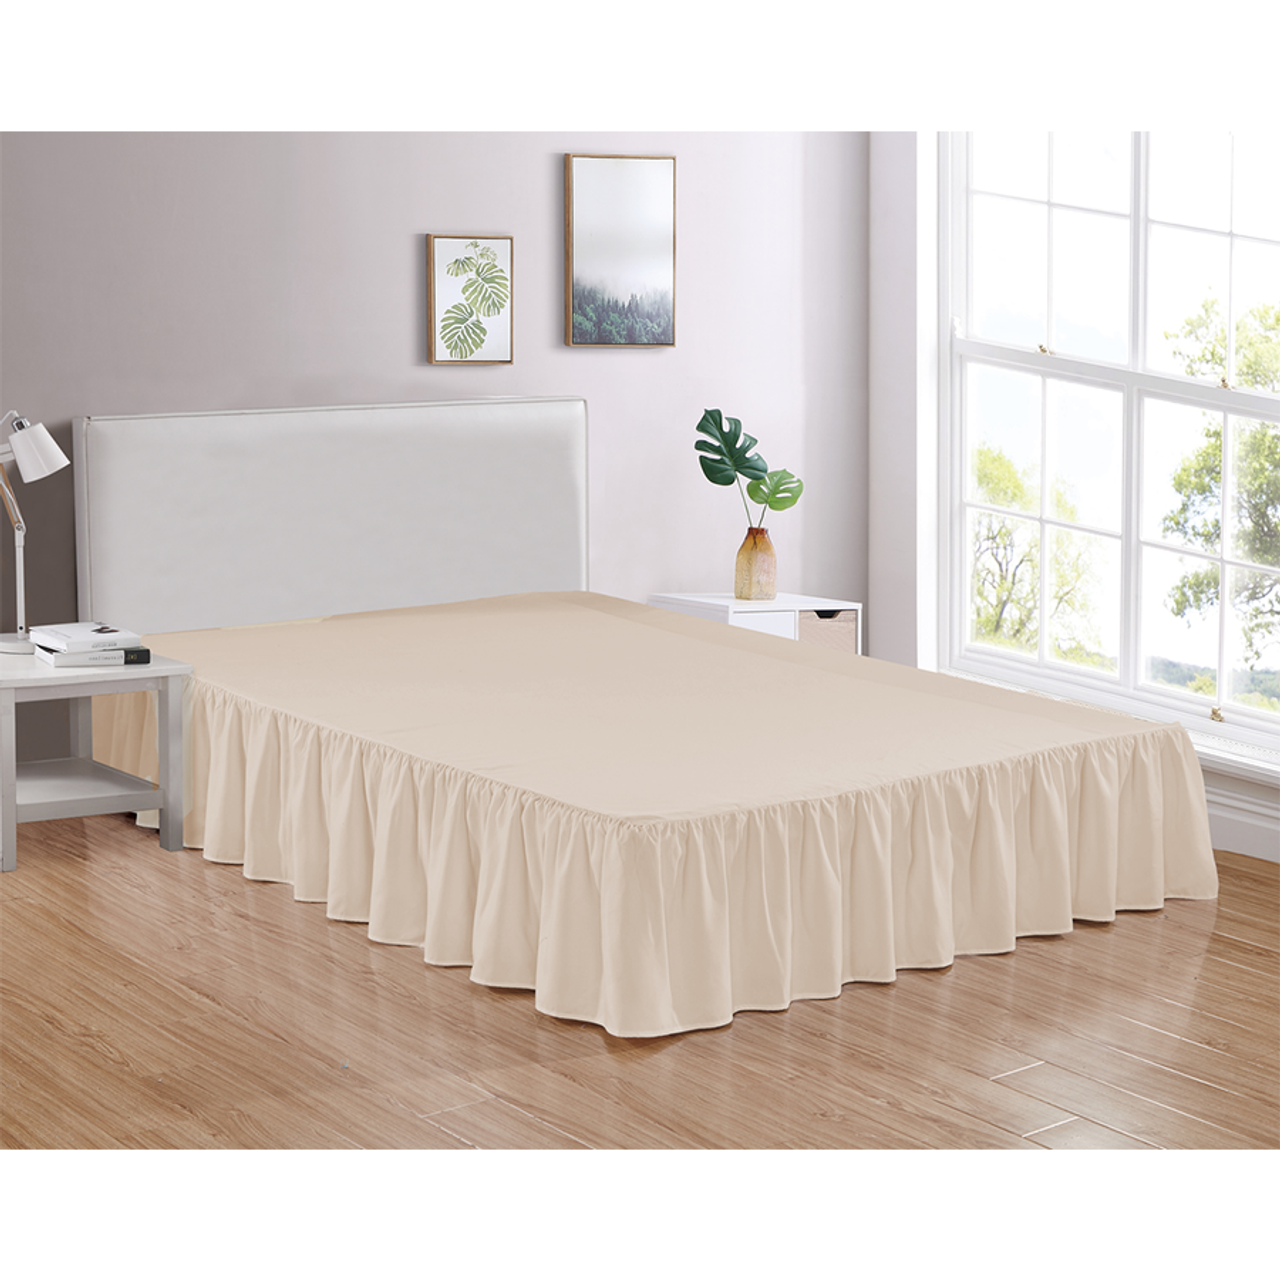 "Beige Bed Skirt Soft Dust Ruffle 100% Brushed Microfiber with 14"" Drop in USA, California, New York, New York City, Los Angeles, San Francisco, Pennsylvania, Washington DC, Virginia, Maryland"